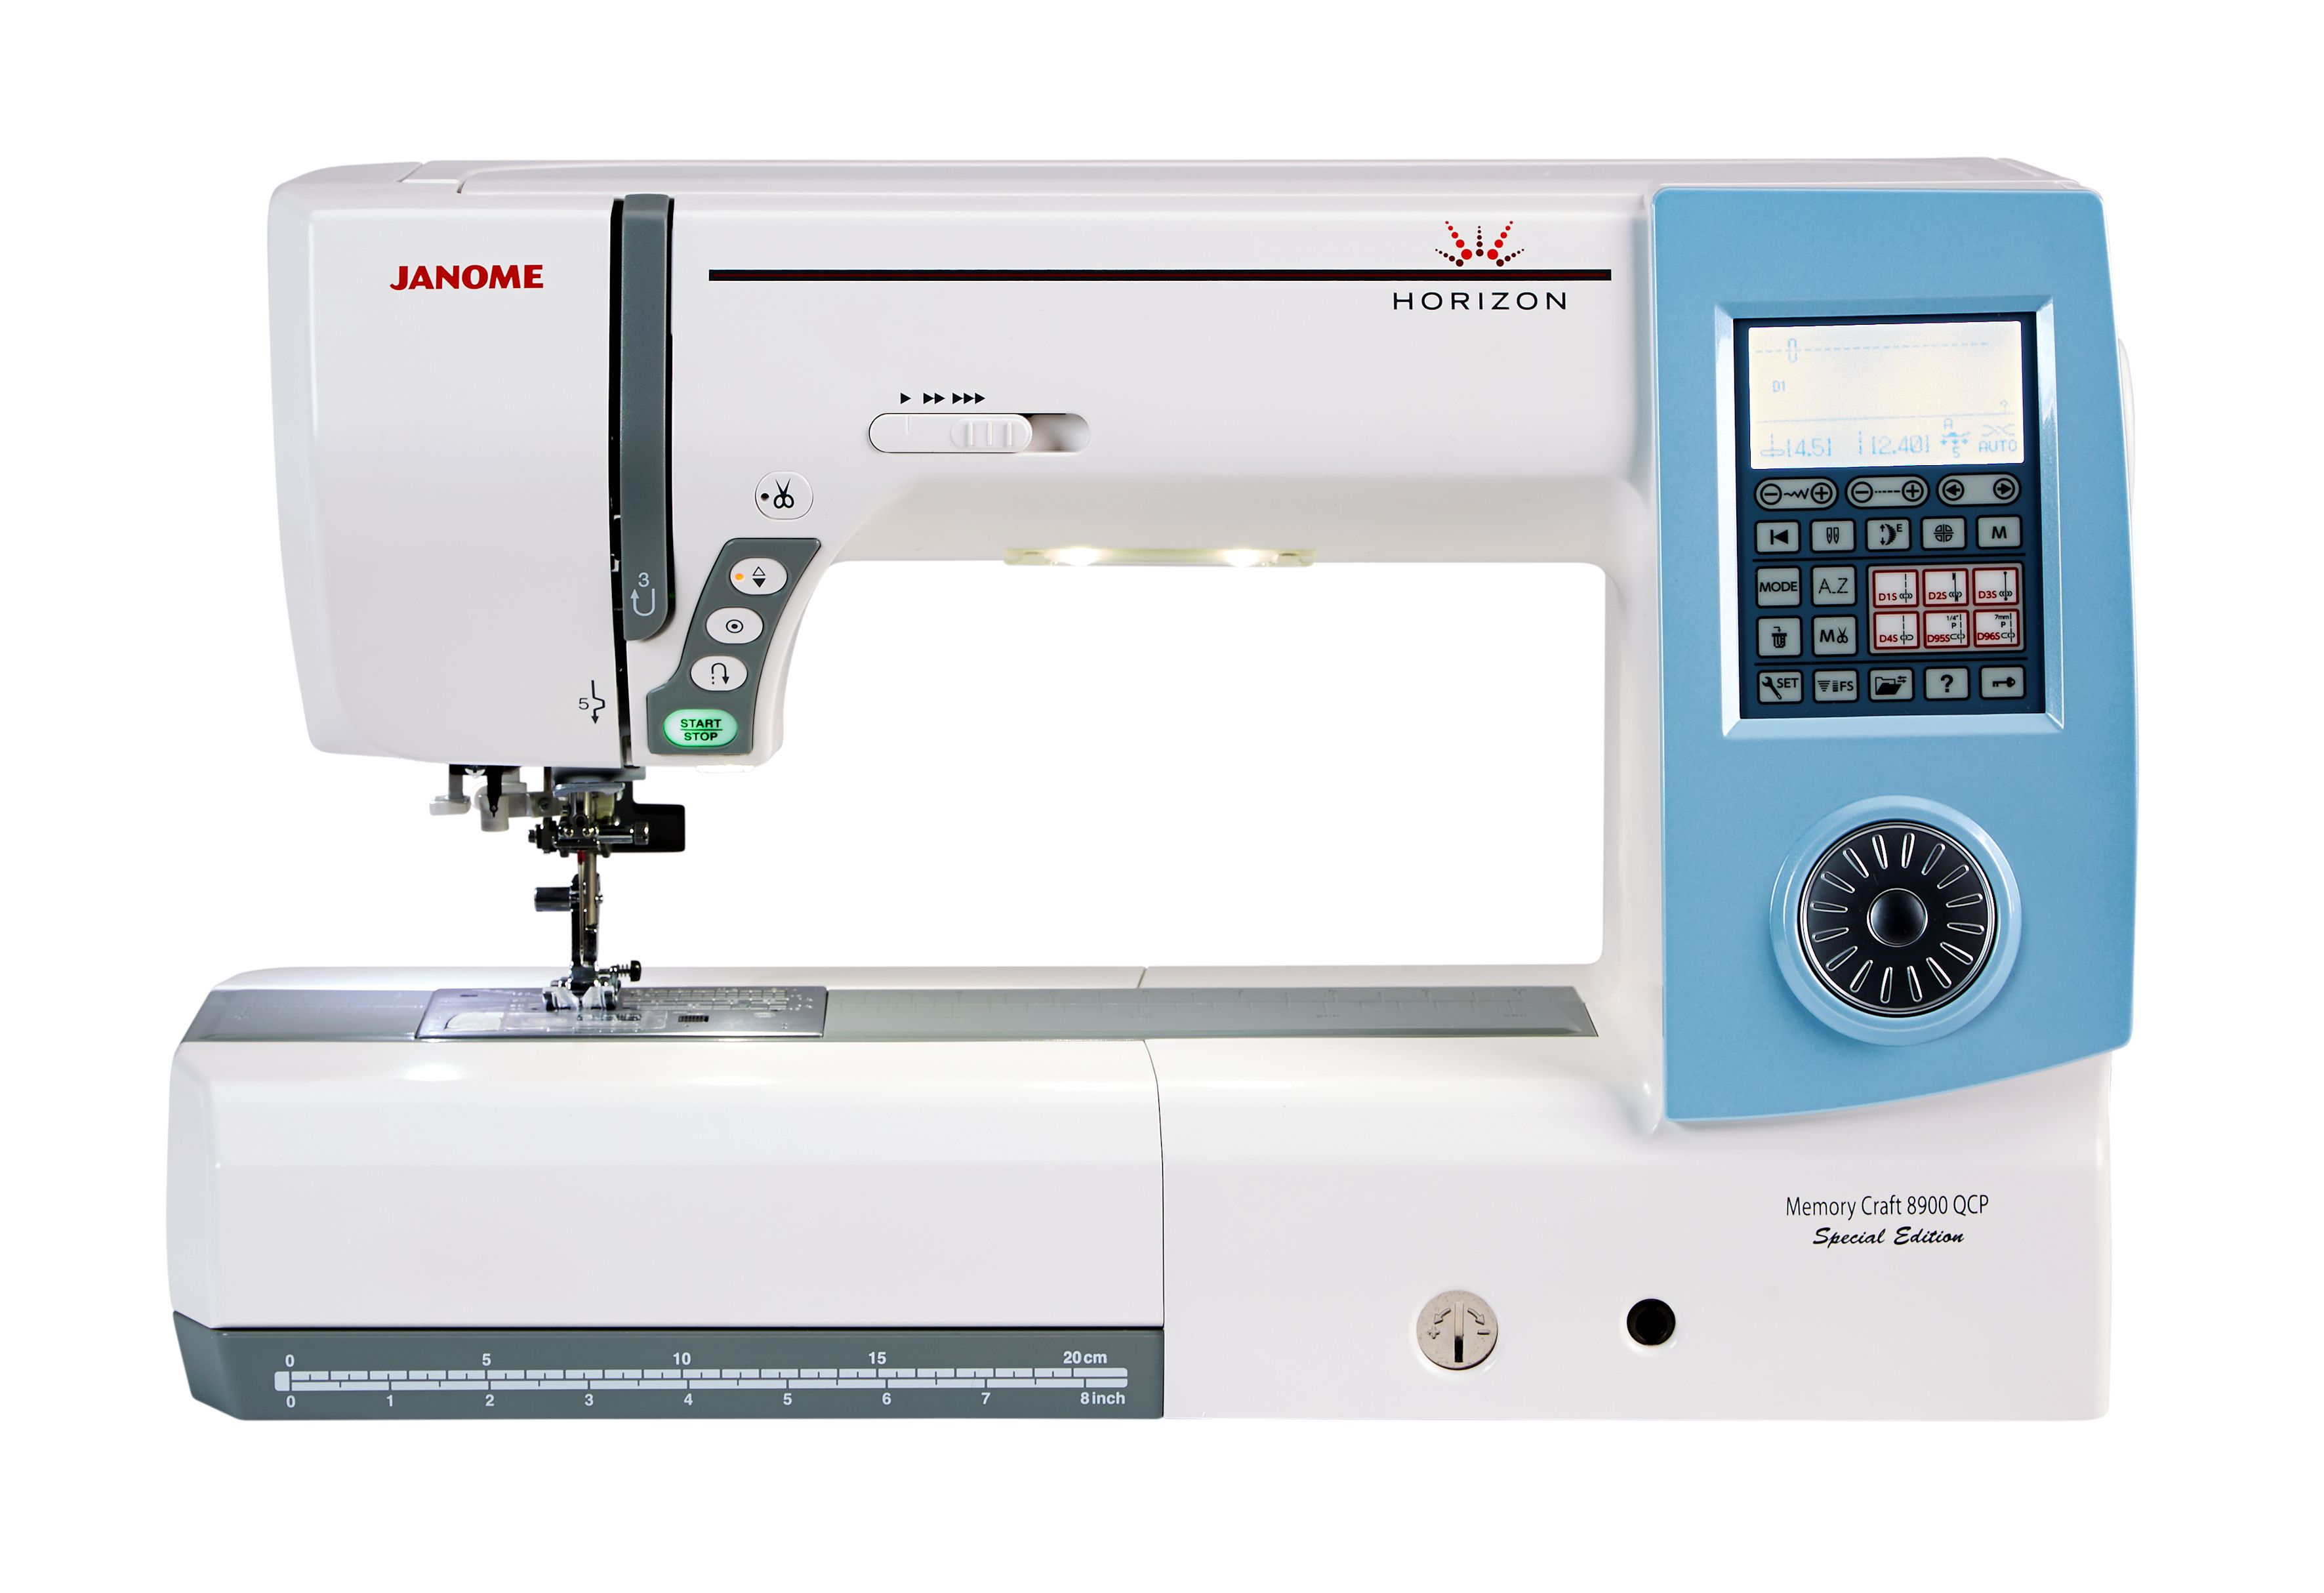 Janome horizon memory craft 8900 - Janome Memory Craft 8900 Special Edition Sewing Machine Reviews Sew Magazine